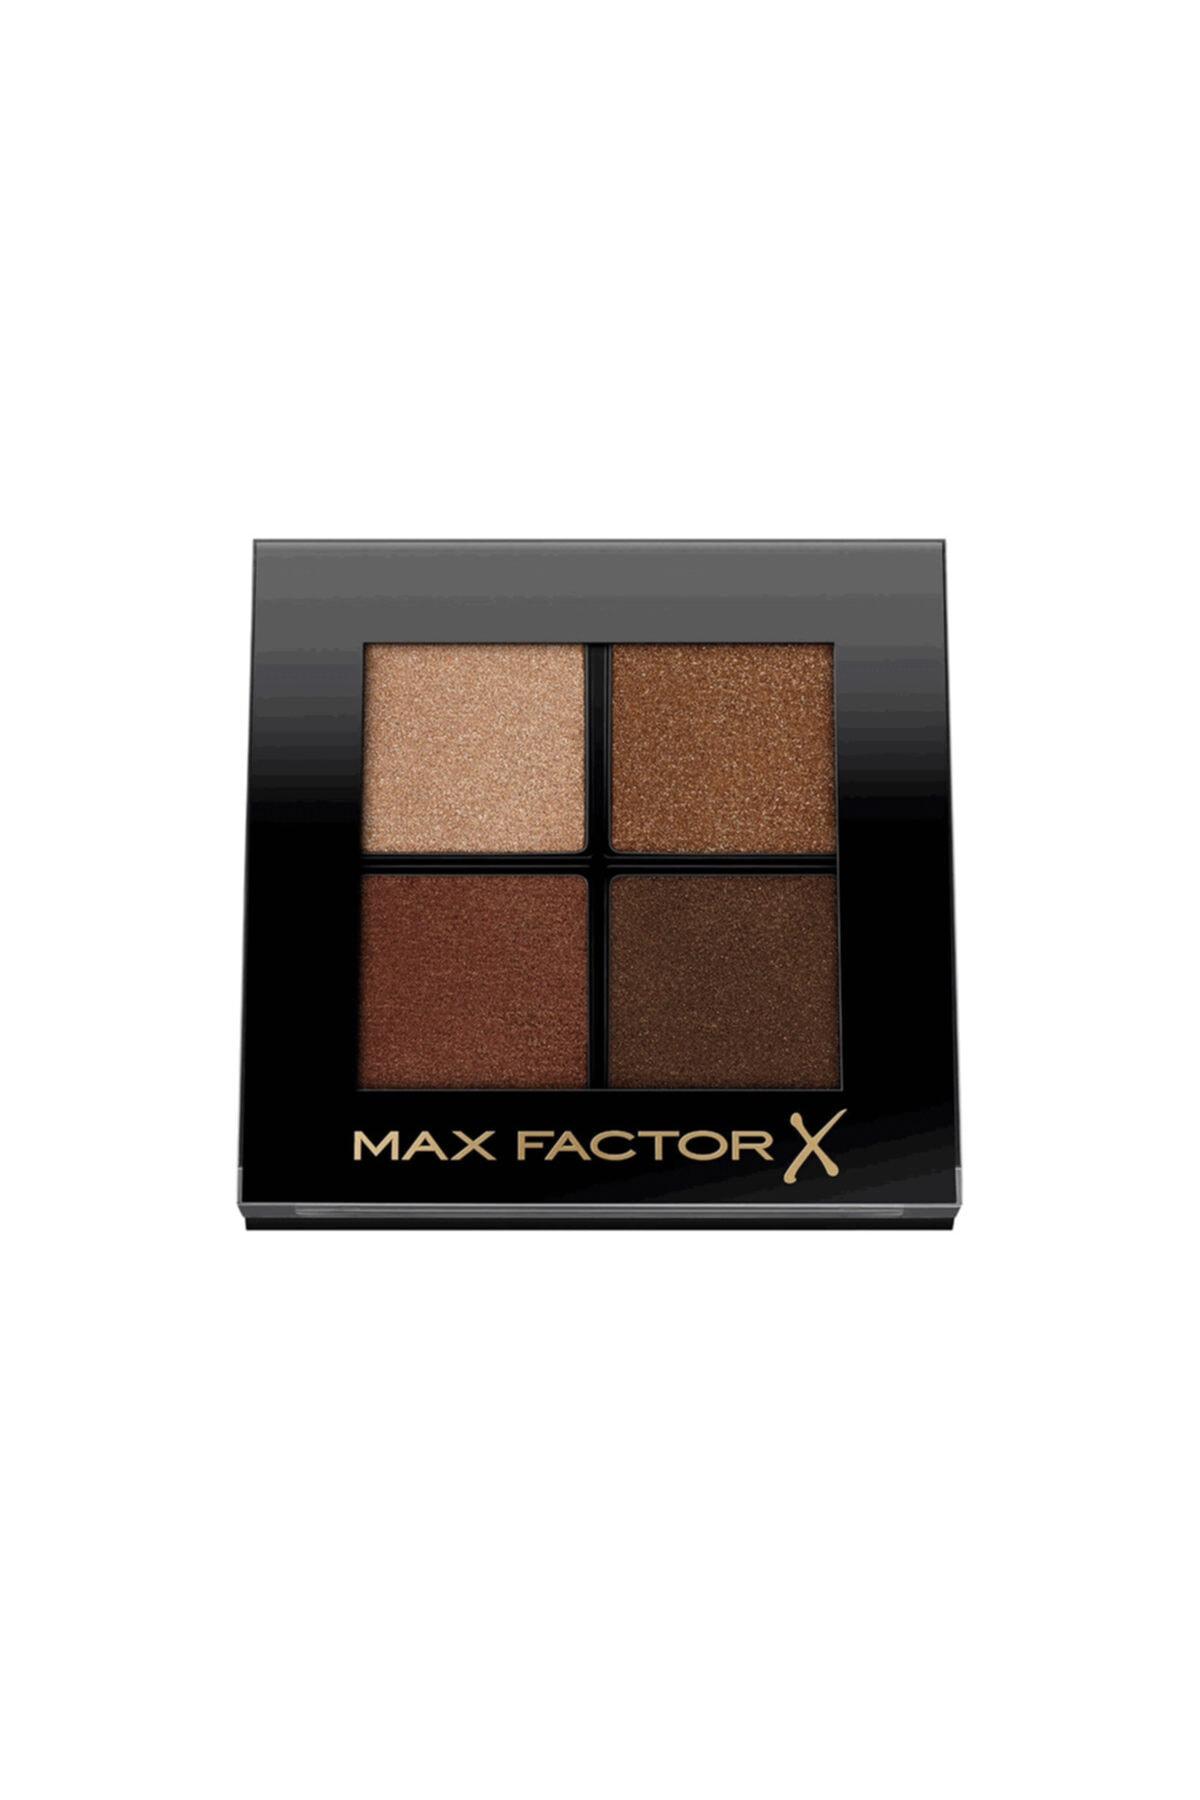 Max Factor Xpert Soft Touch Far Paleti Veiled Bronze 1